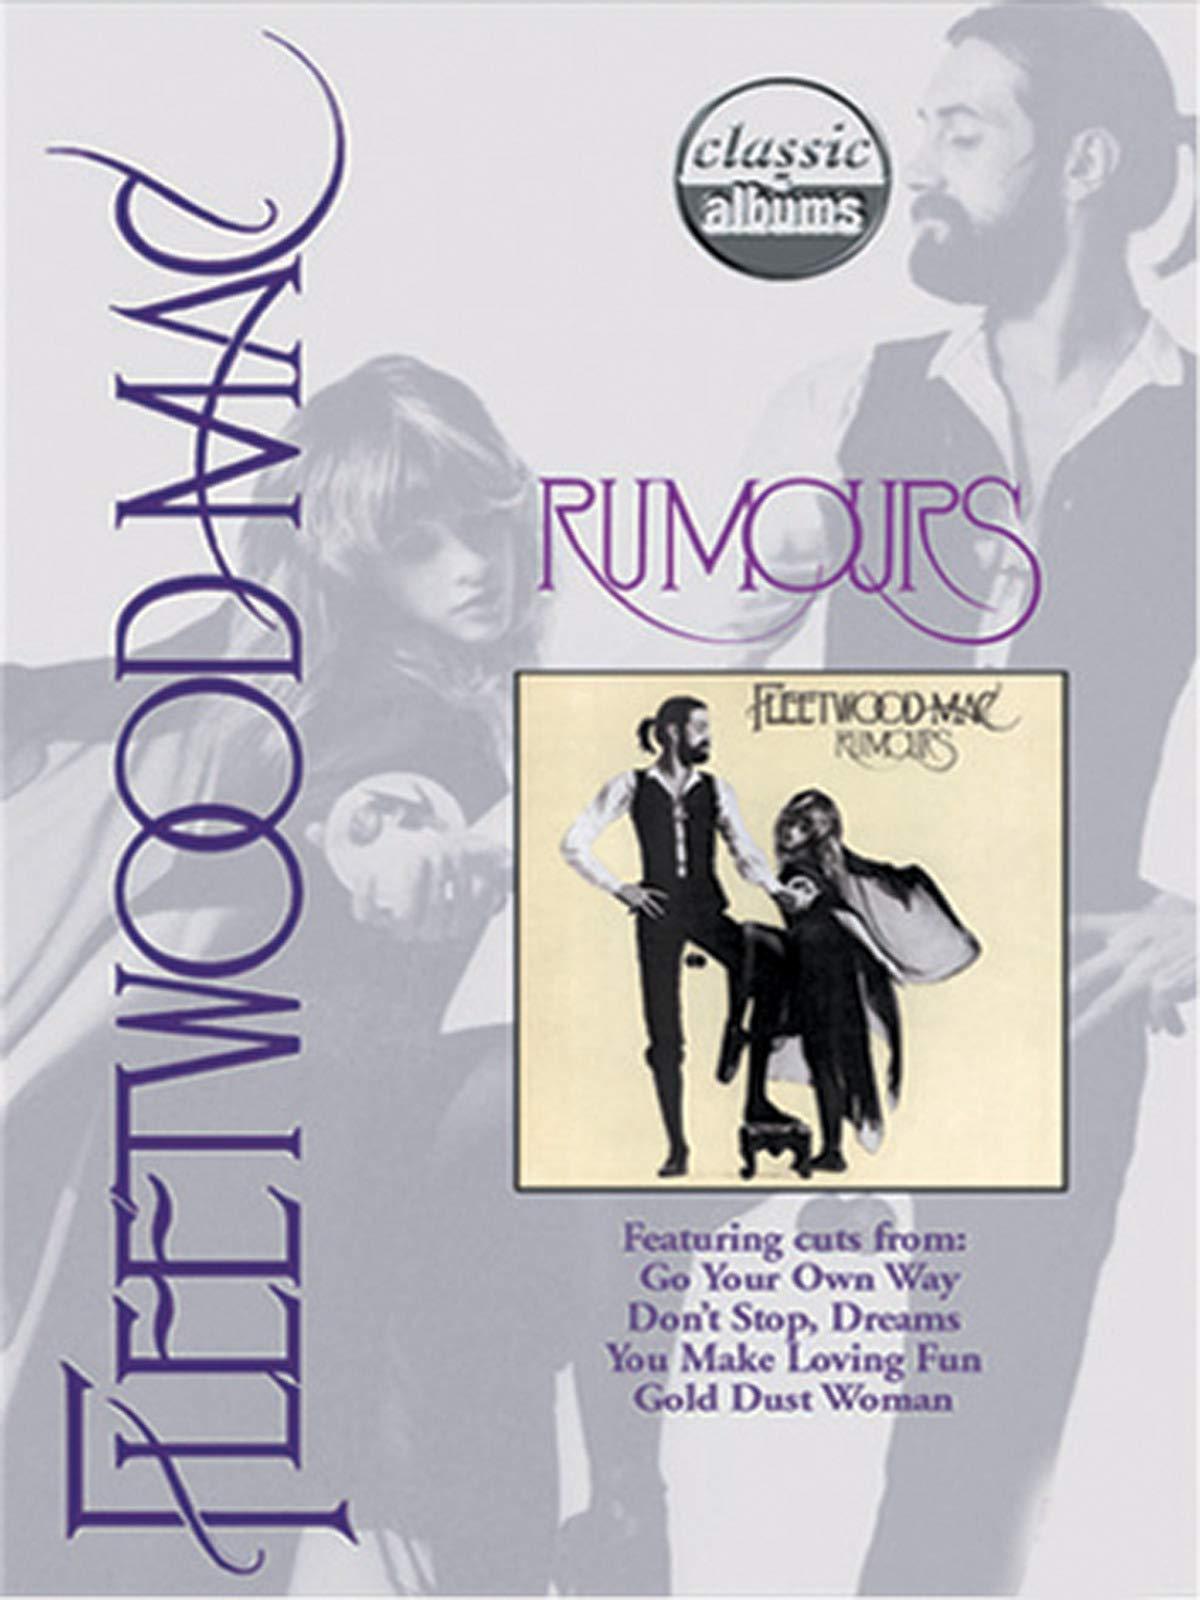 Fleetwood Mac - Rumours (Classic Album) on Amazon Prime Video UK